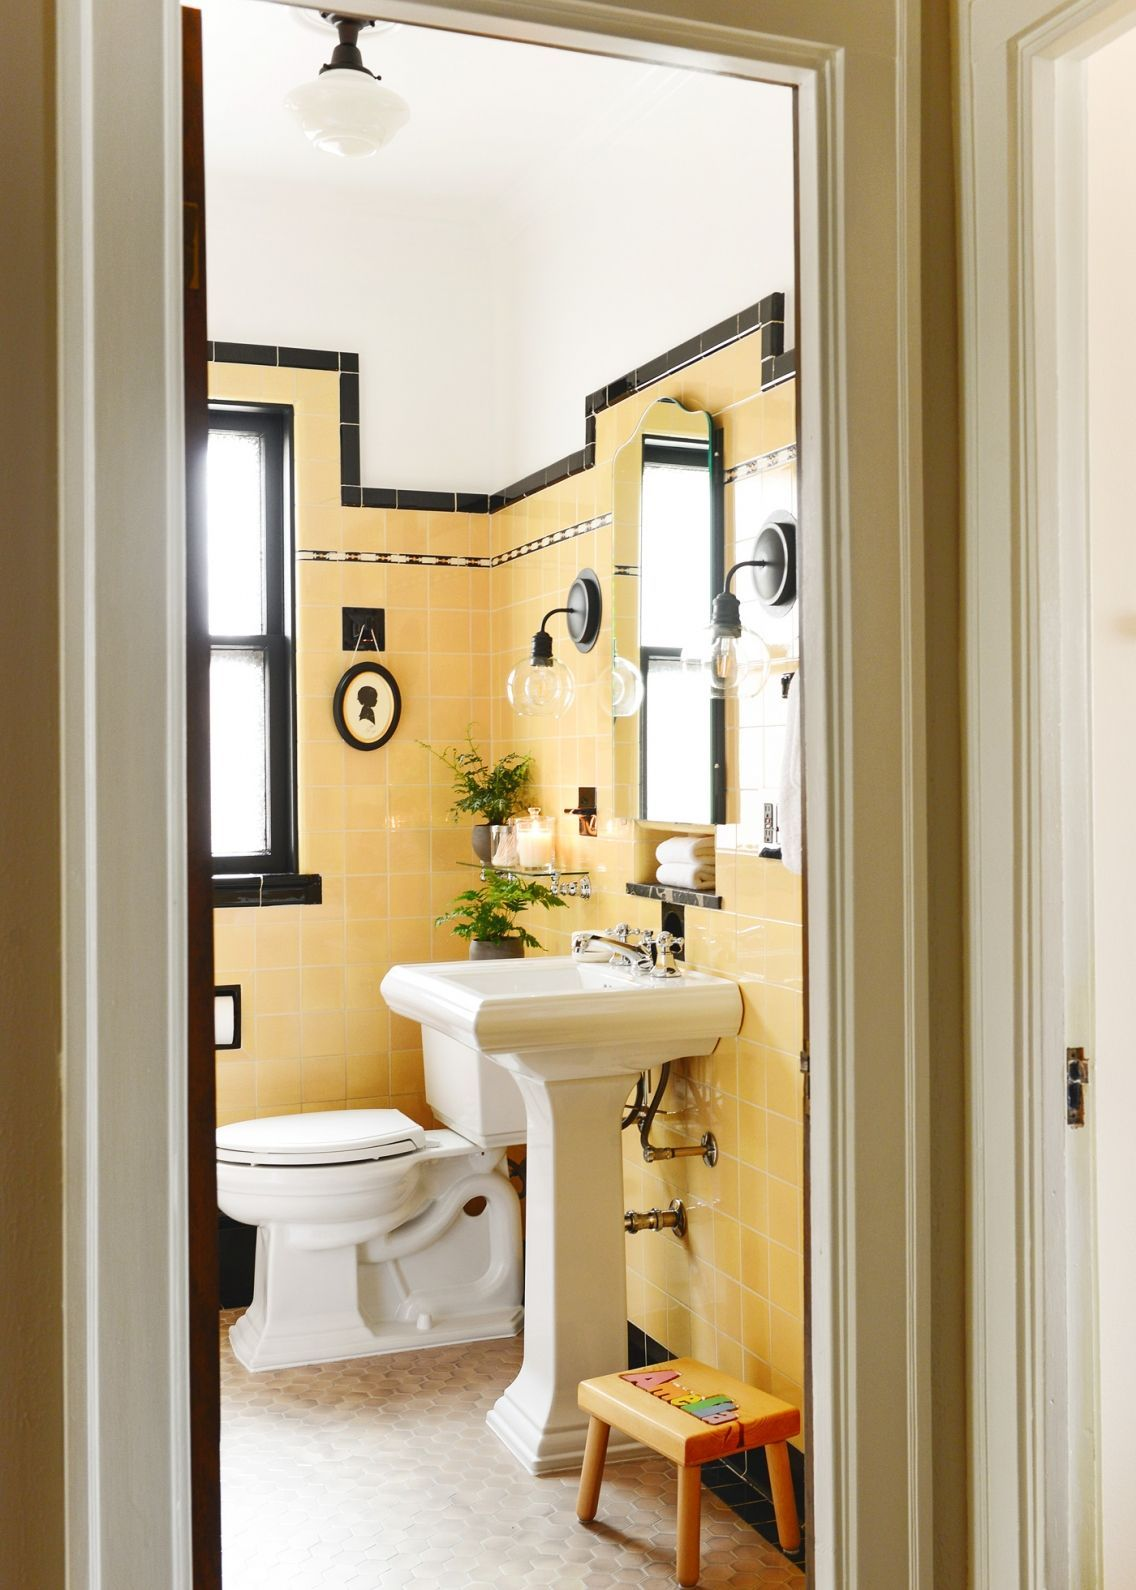 How To Refresh A Vintage Bathroom Keep The Charm Ii Of Ii House